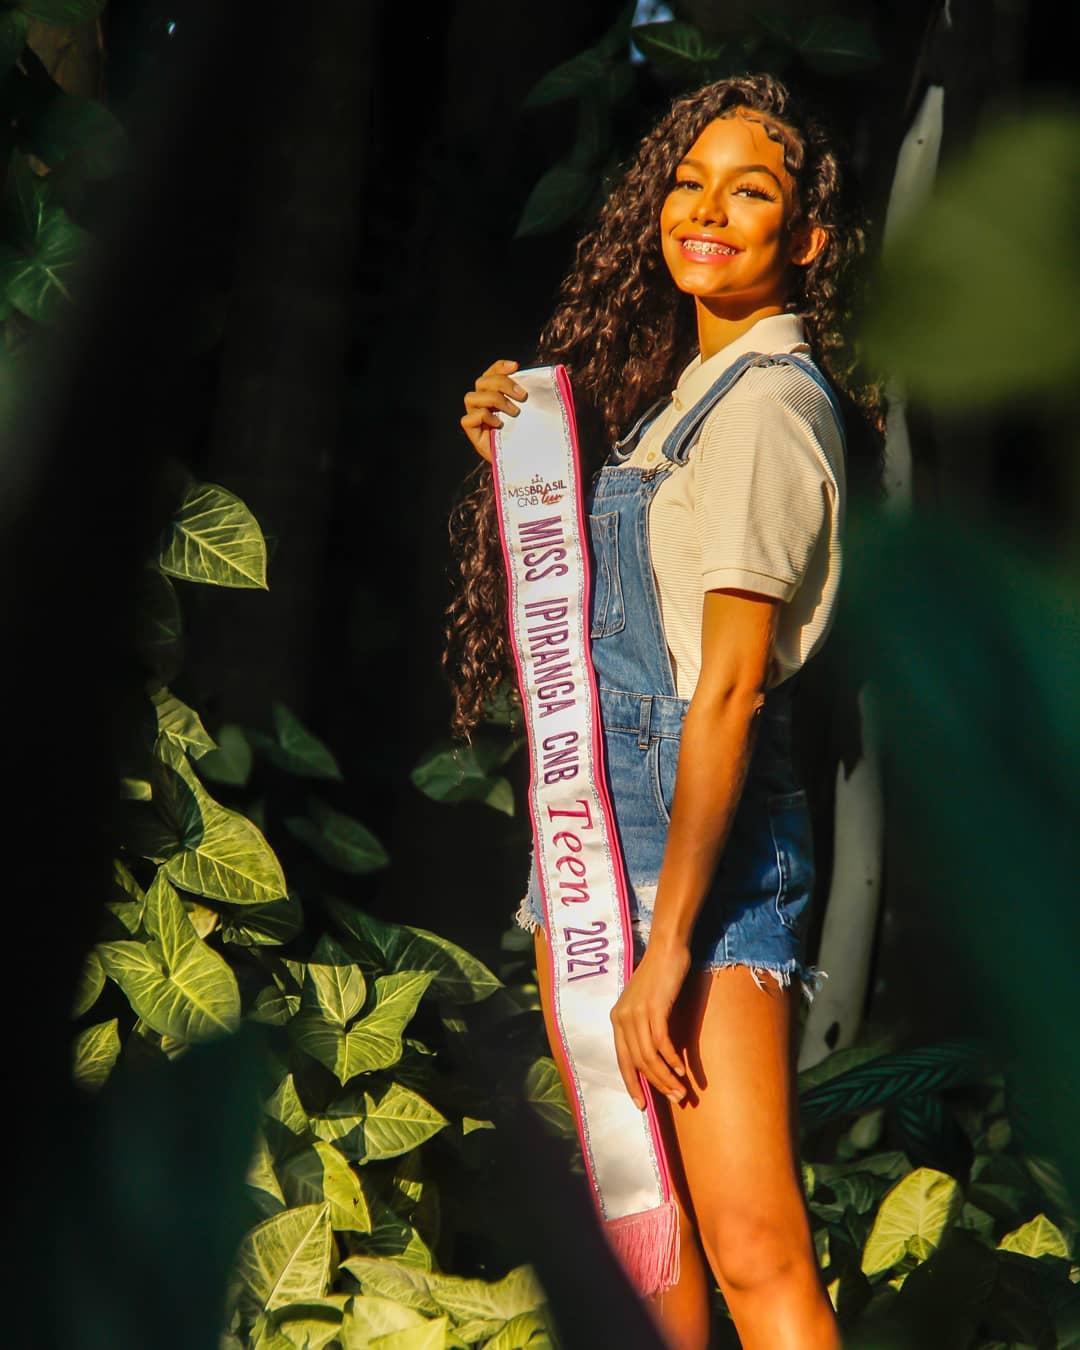 yasmin teles, miss teen brasil mundial 2021. 22031811